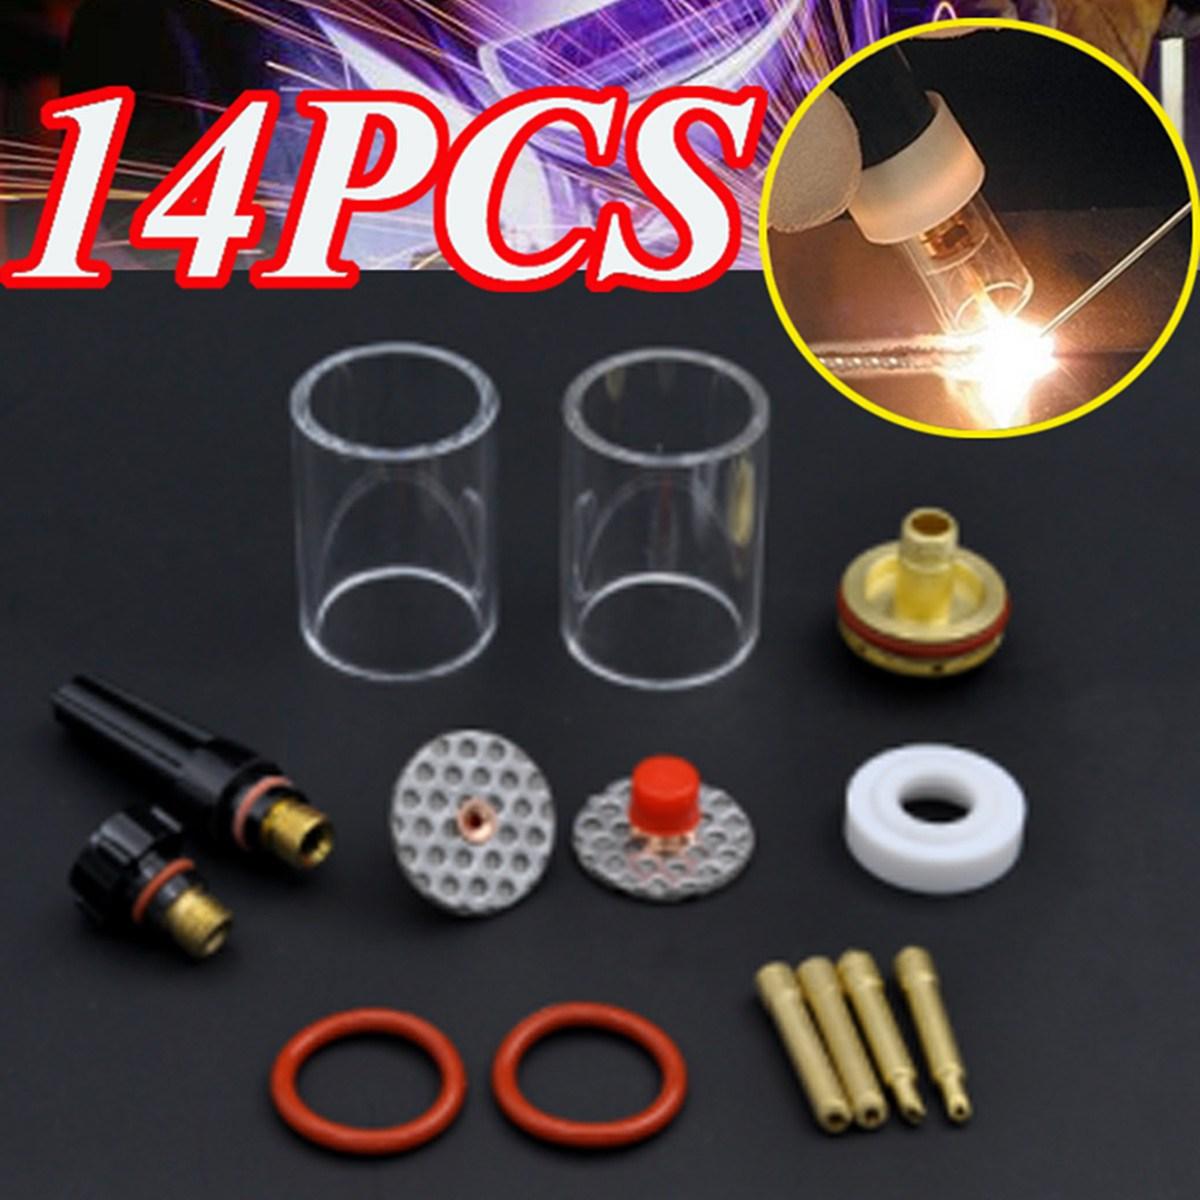 14PCS 1.0mm 0.040 TIG Welding Torch Stubby Gas Lens Glass Cup For WP17/18/26 Series 1set 14pcs tig welding torch stubby gas lens glass pyrex cup kit 3 2mm 1 8 for wp17 18 26 welding series